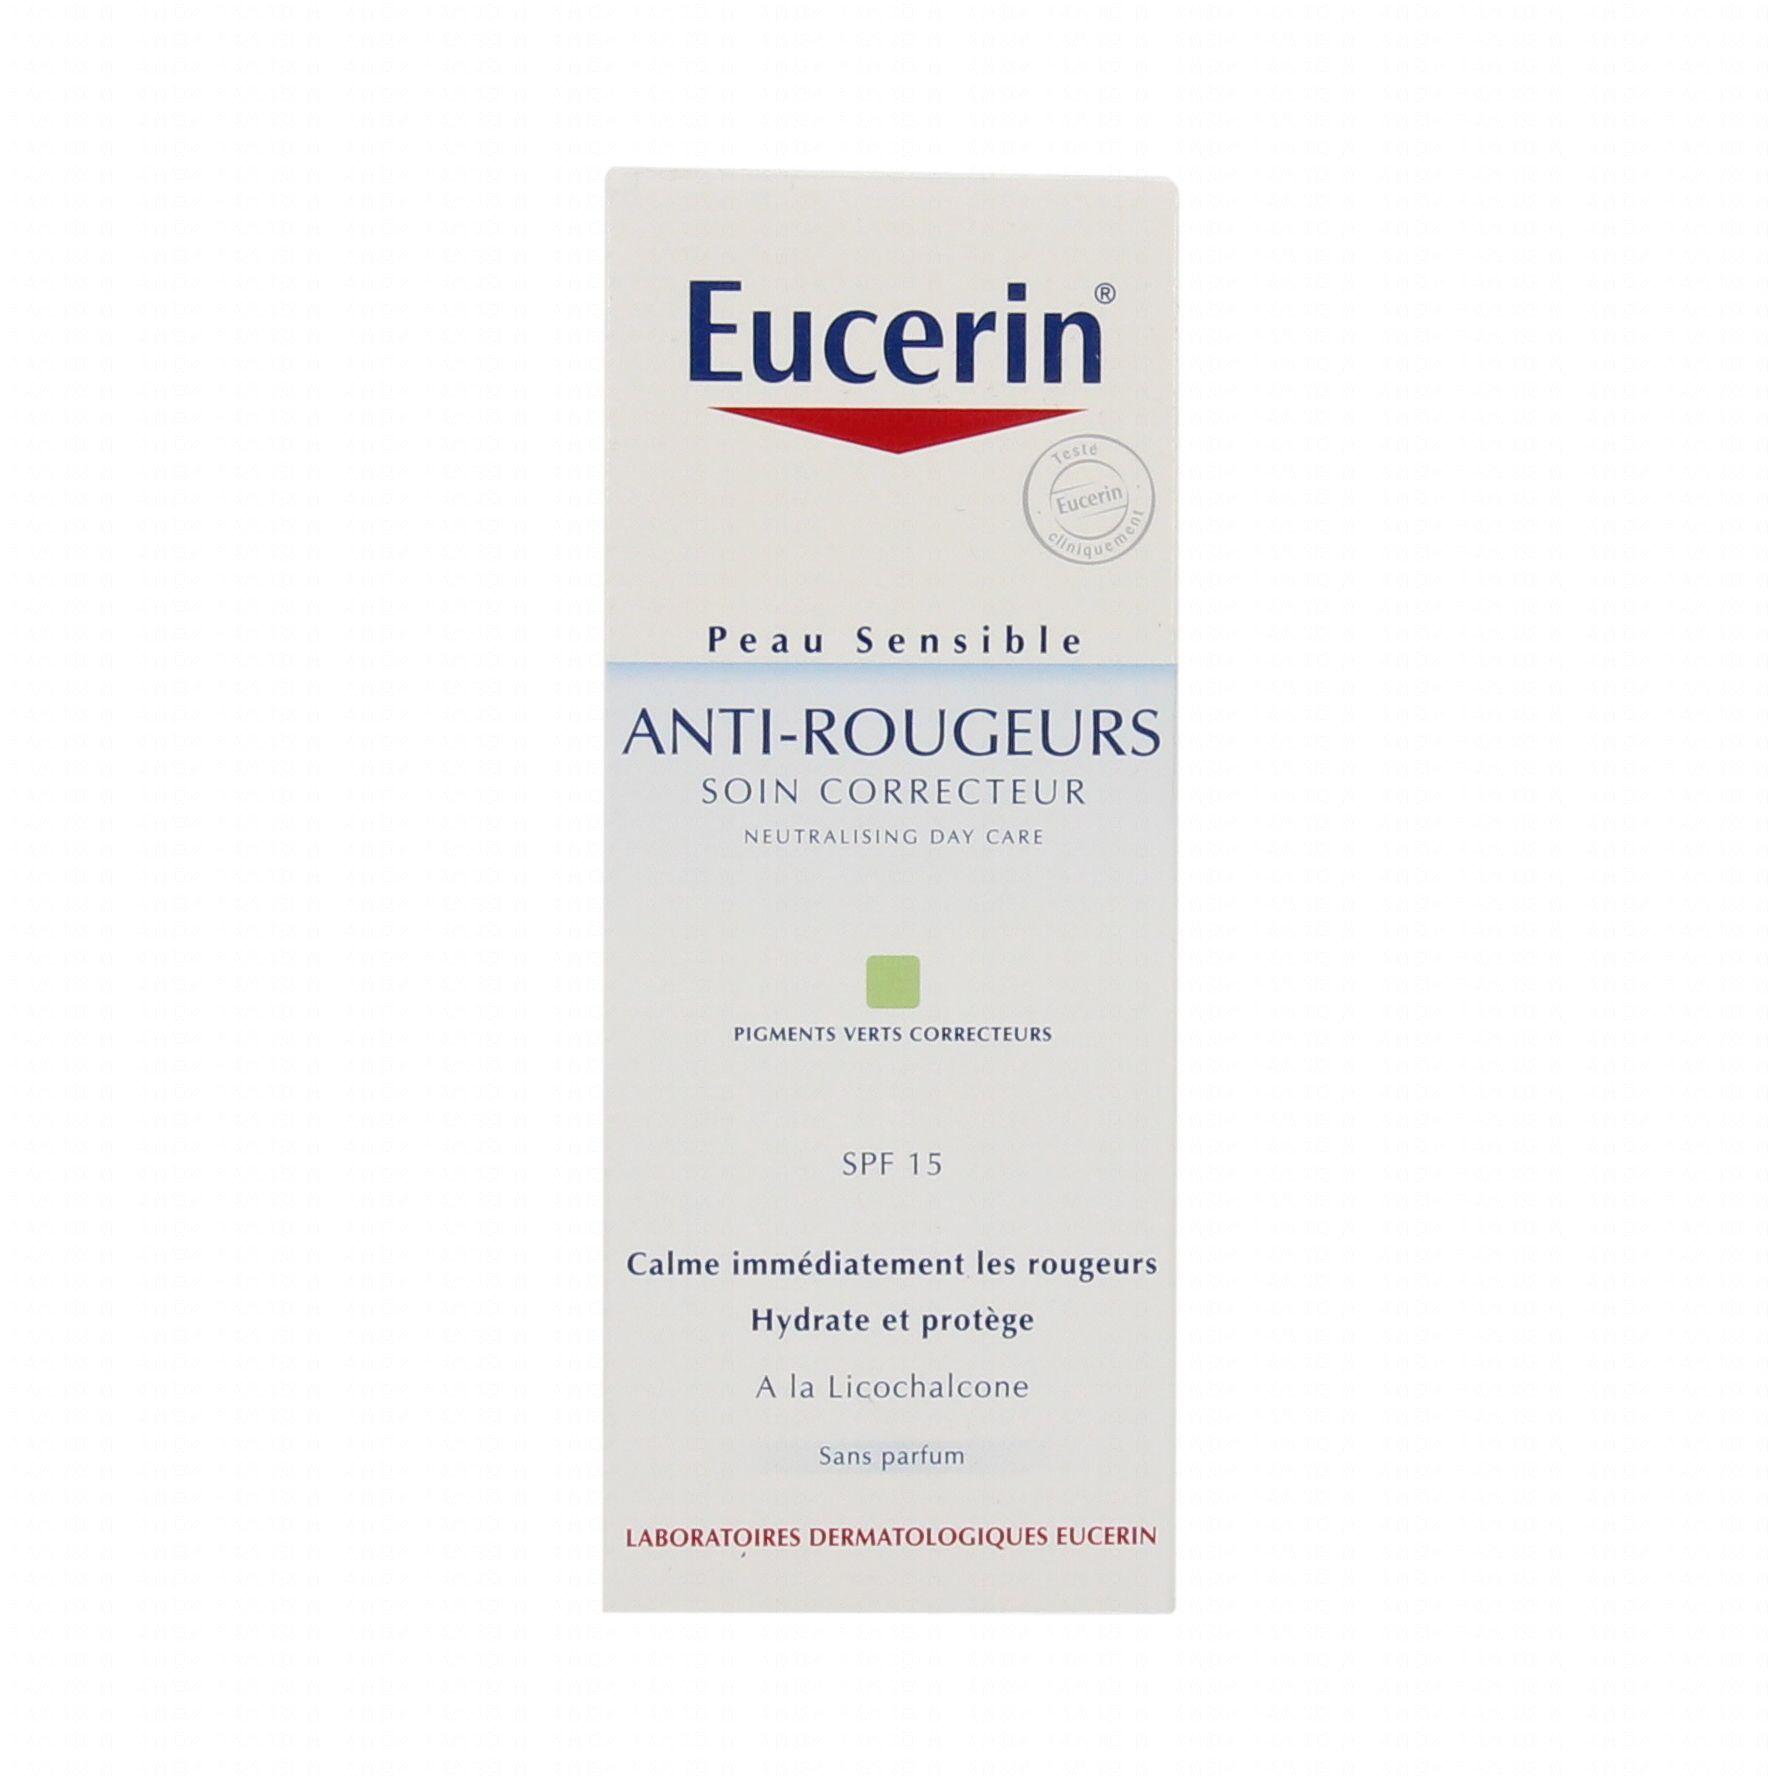 EUCERIN Anti-rougeurs soin correcteur flacon 50ml